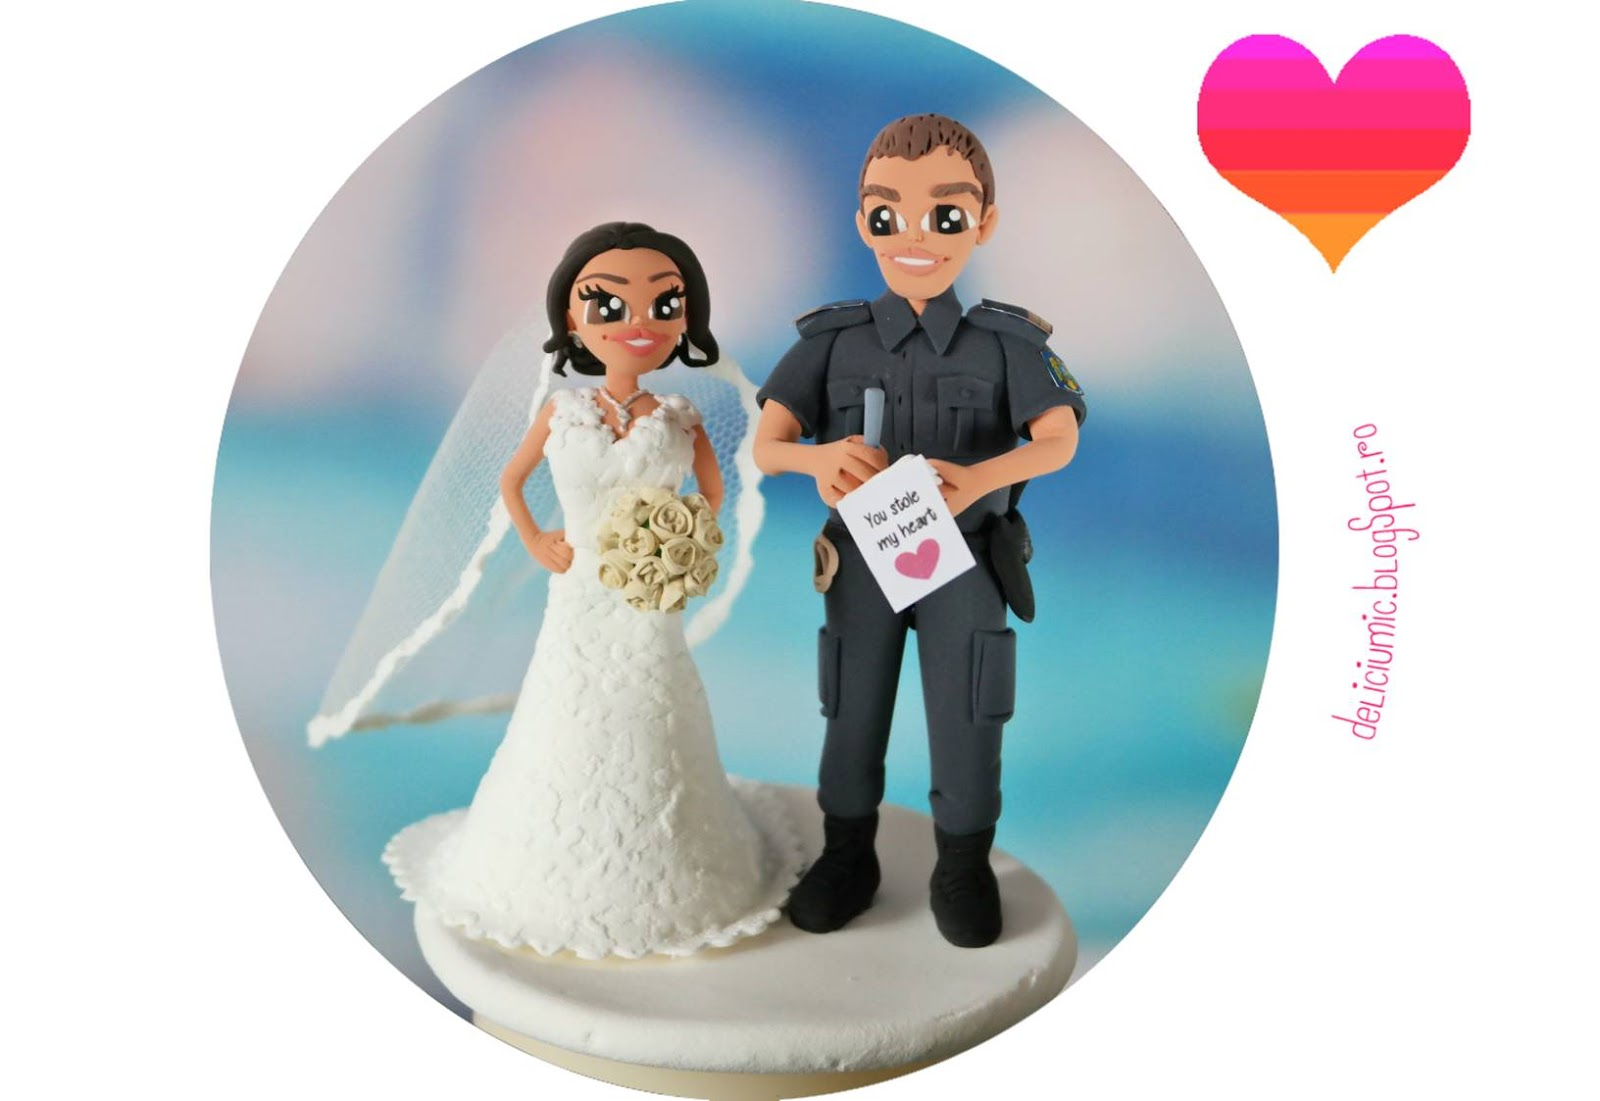 Figurine tort jandarm